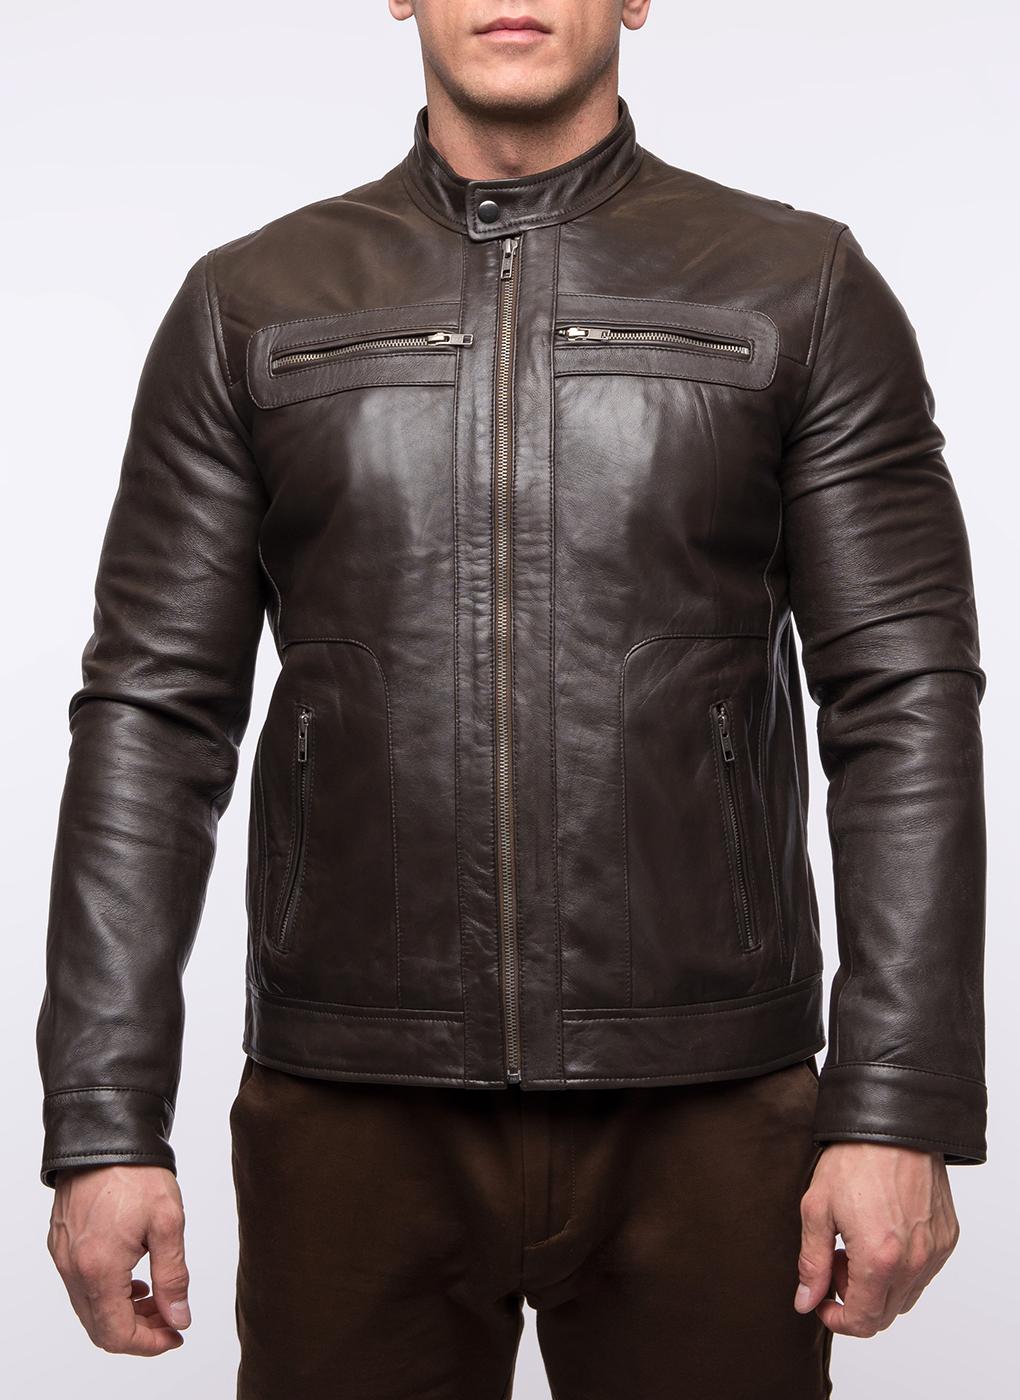 Кожаная куртка мужская 07, Gotthold фото